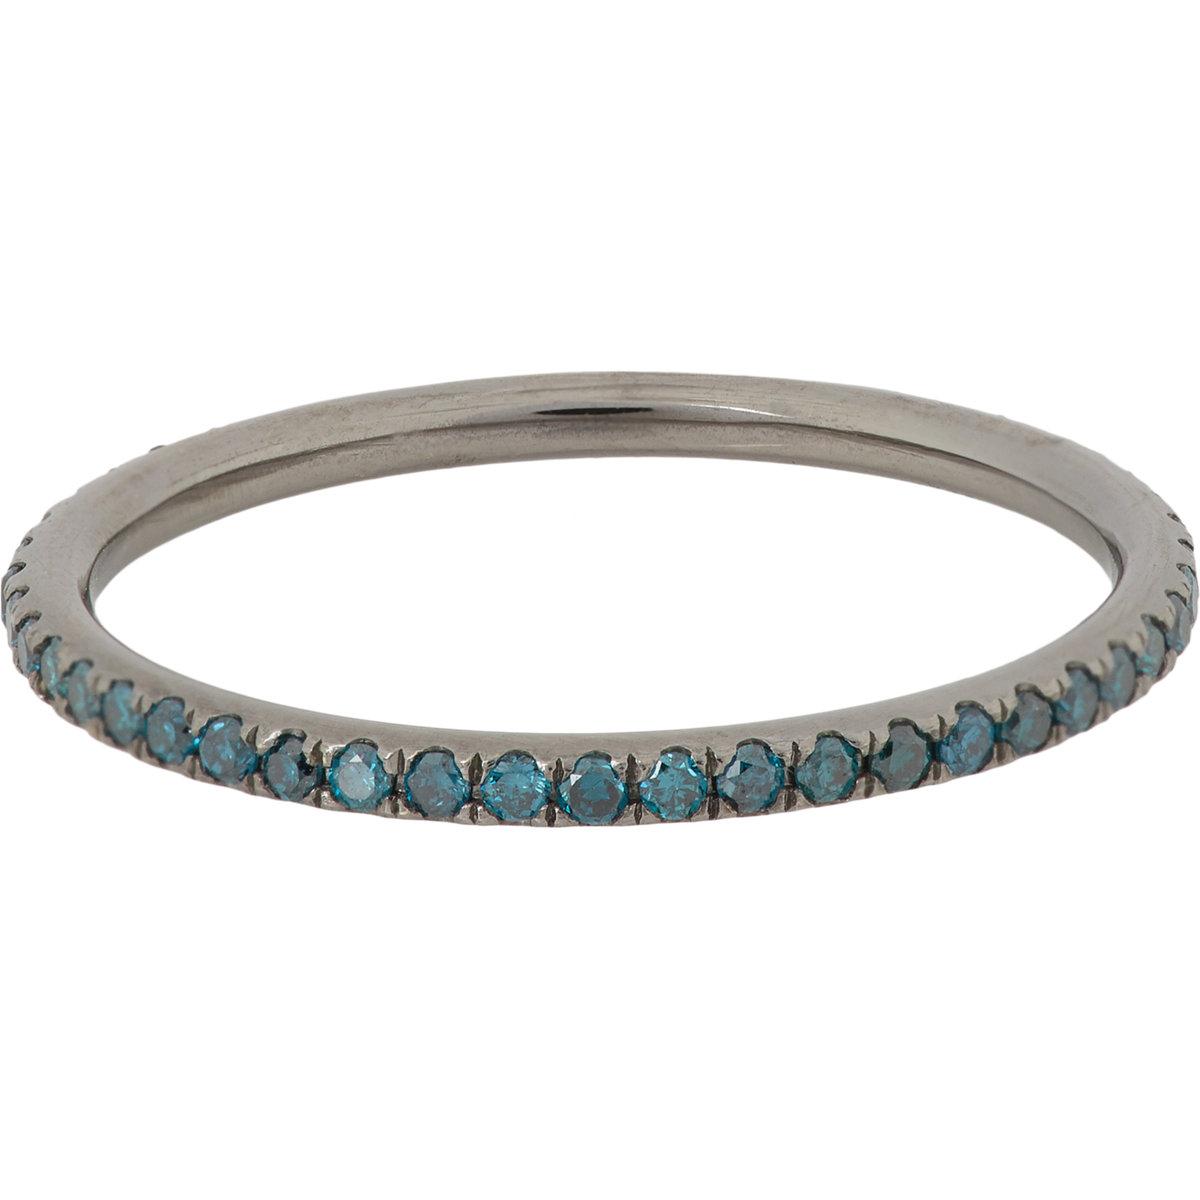 Ileana Makri Thread Band diamond ring - Unavailable 7NuBQ